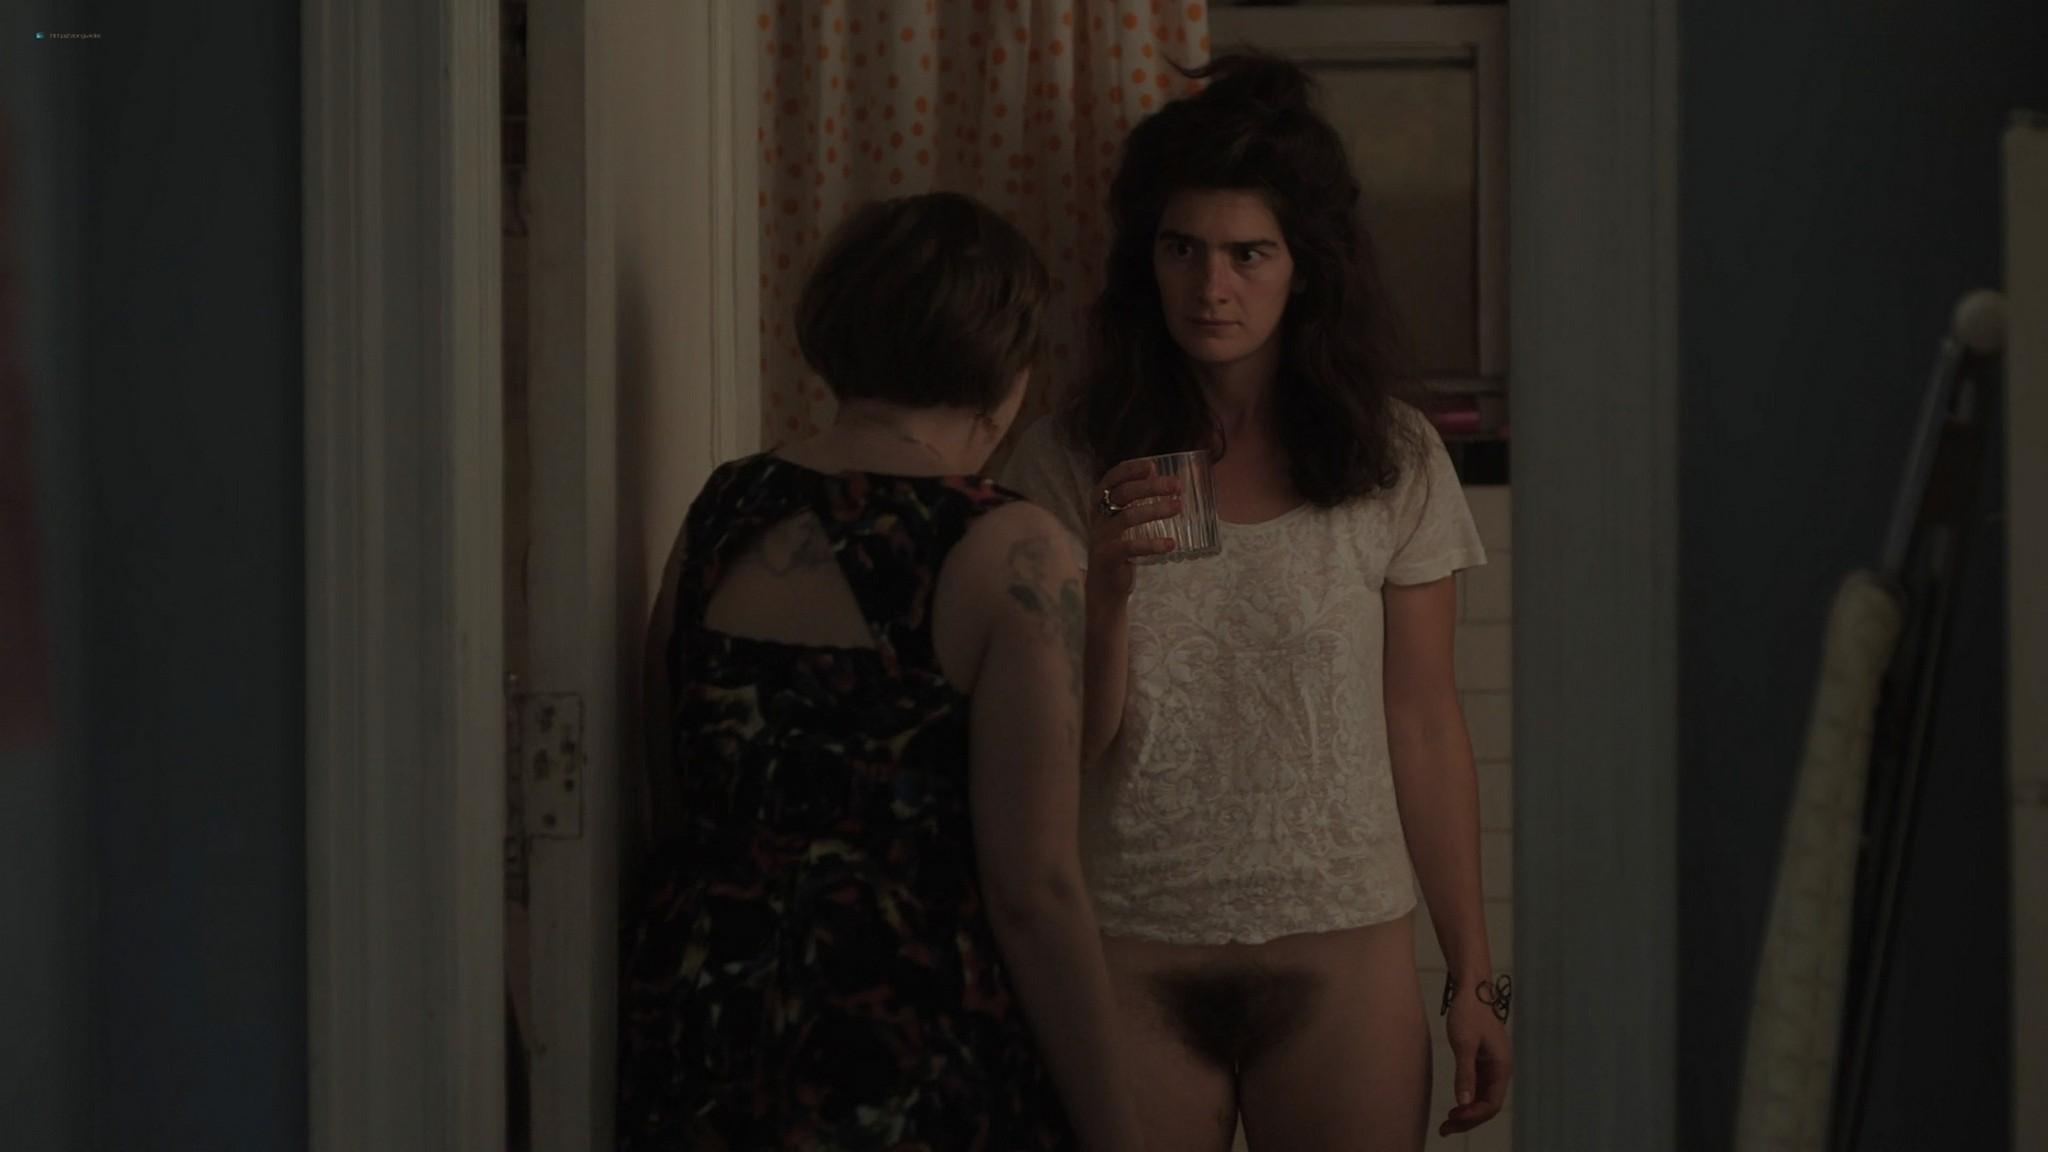 Gaby Hoffmann nude full frontal Allison Williams sex Lena Dunham nude Girls 2012 s3e1 5 1080p Web 6